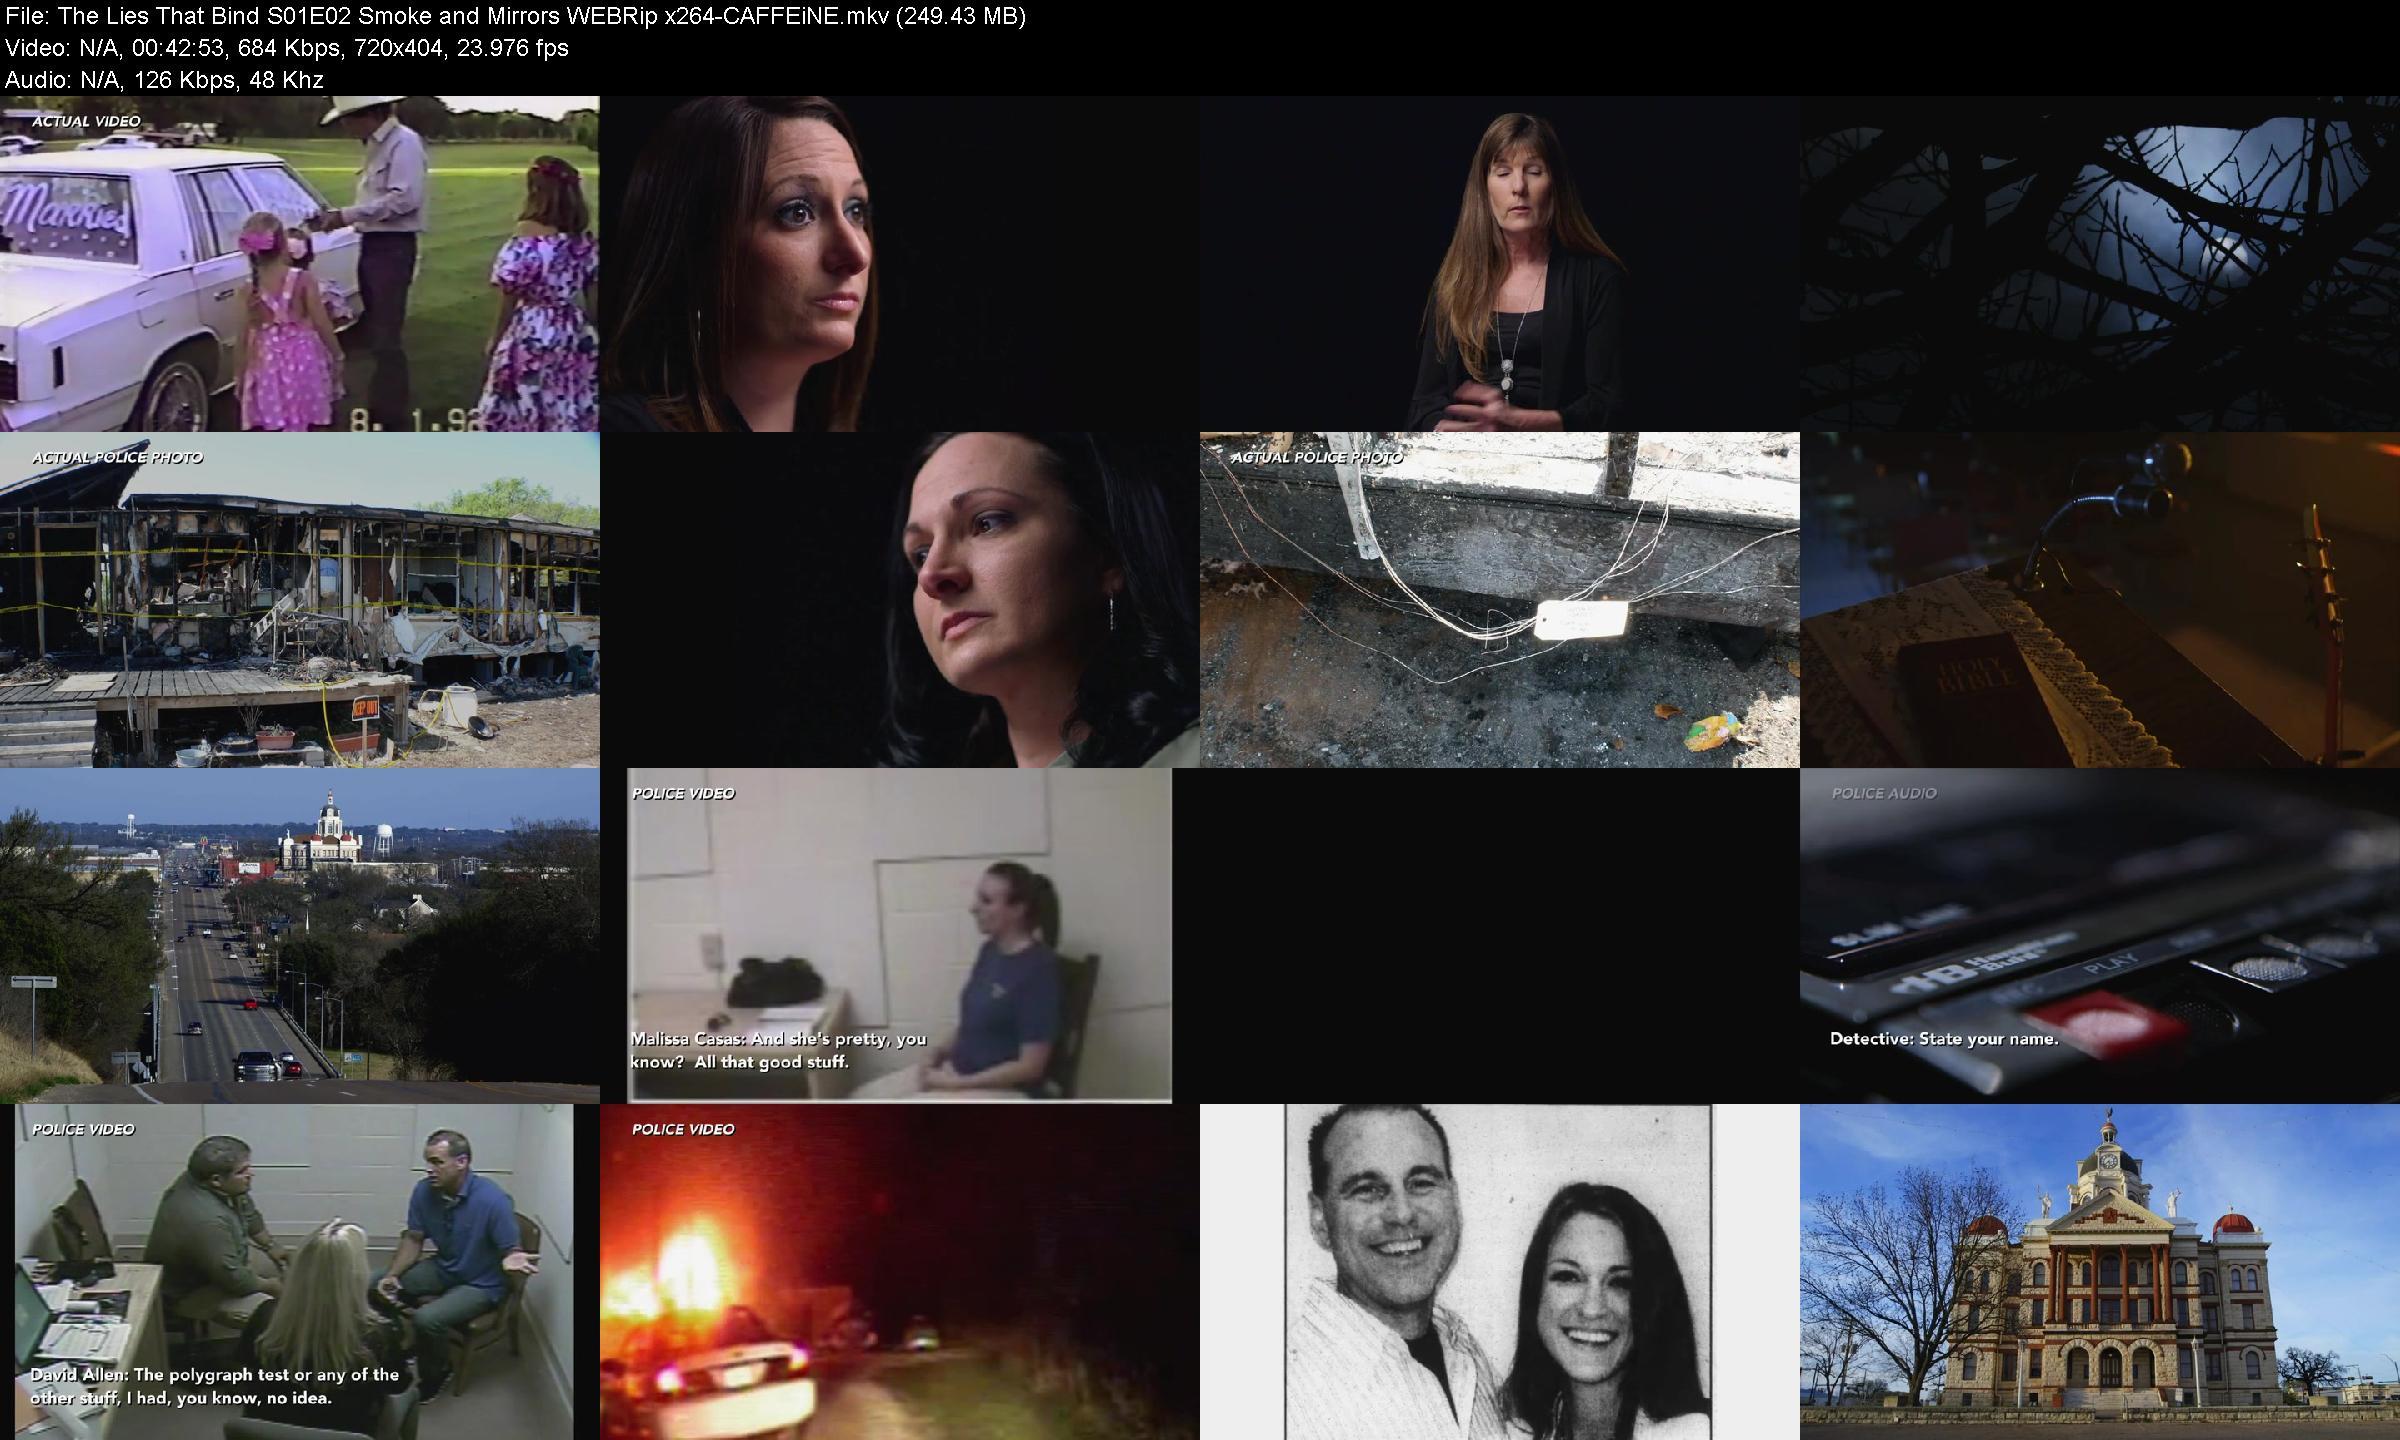 The Lies That Bind S01e02 Smoke And Mirrors Webrip X264-caffeine